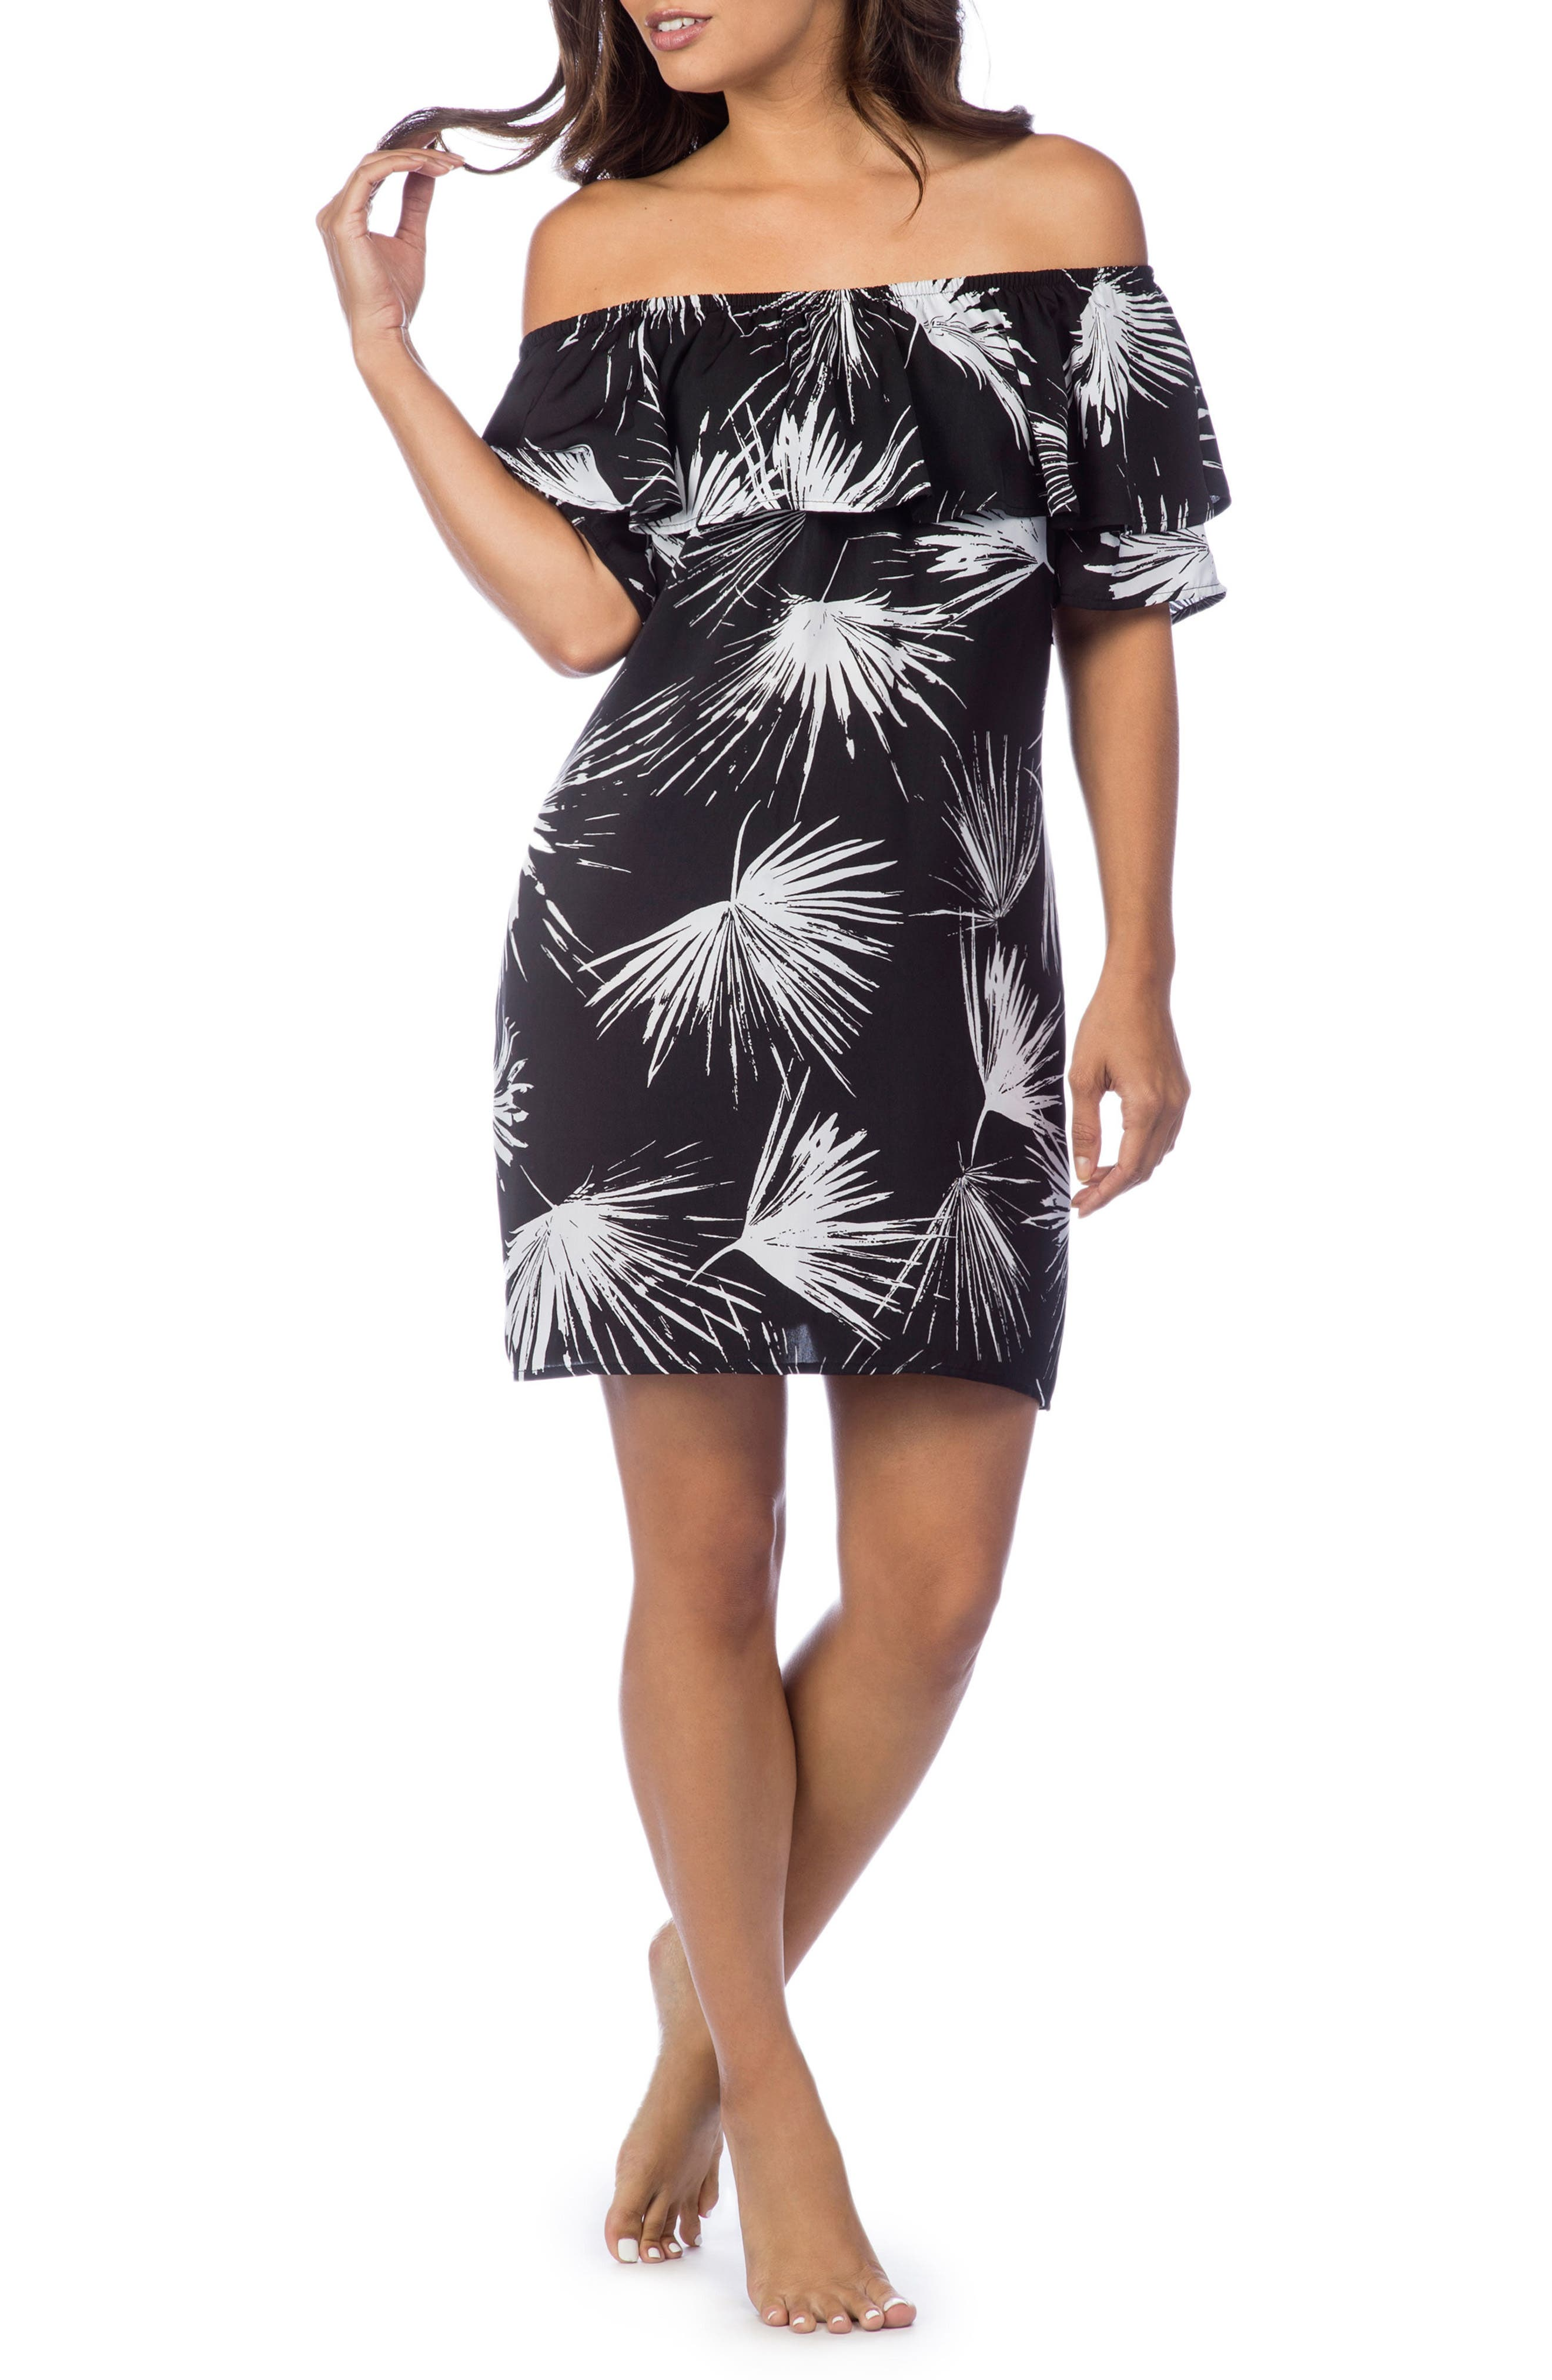 Alternate Image 1 Selected - La Blanca Petal Pusher Off the Shoulder Dress